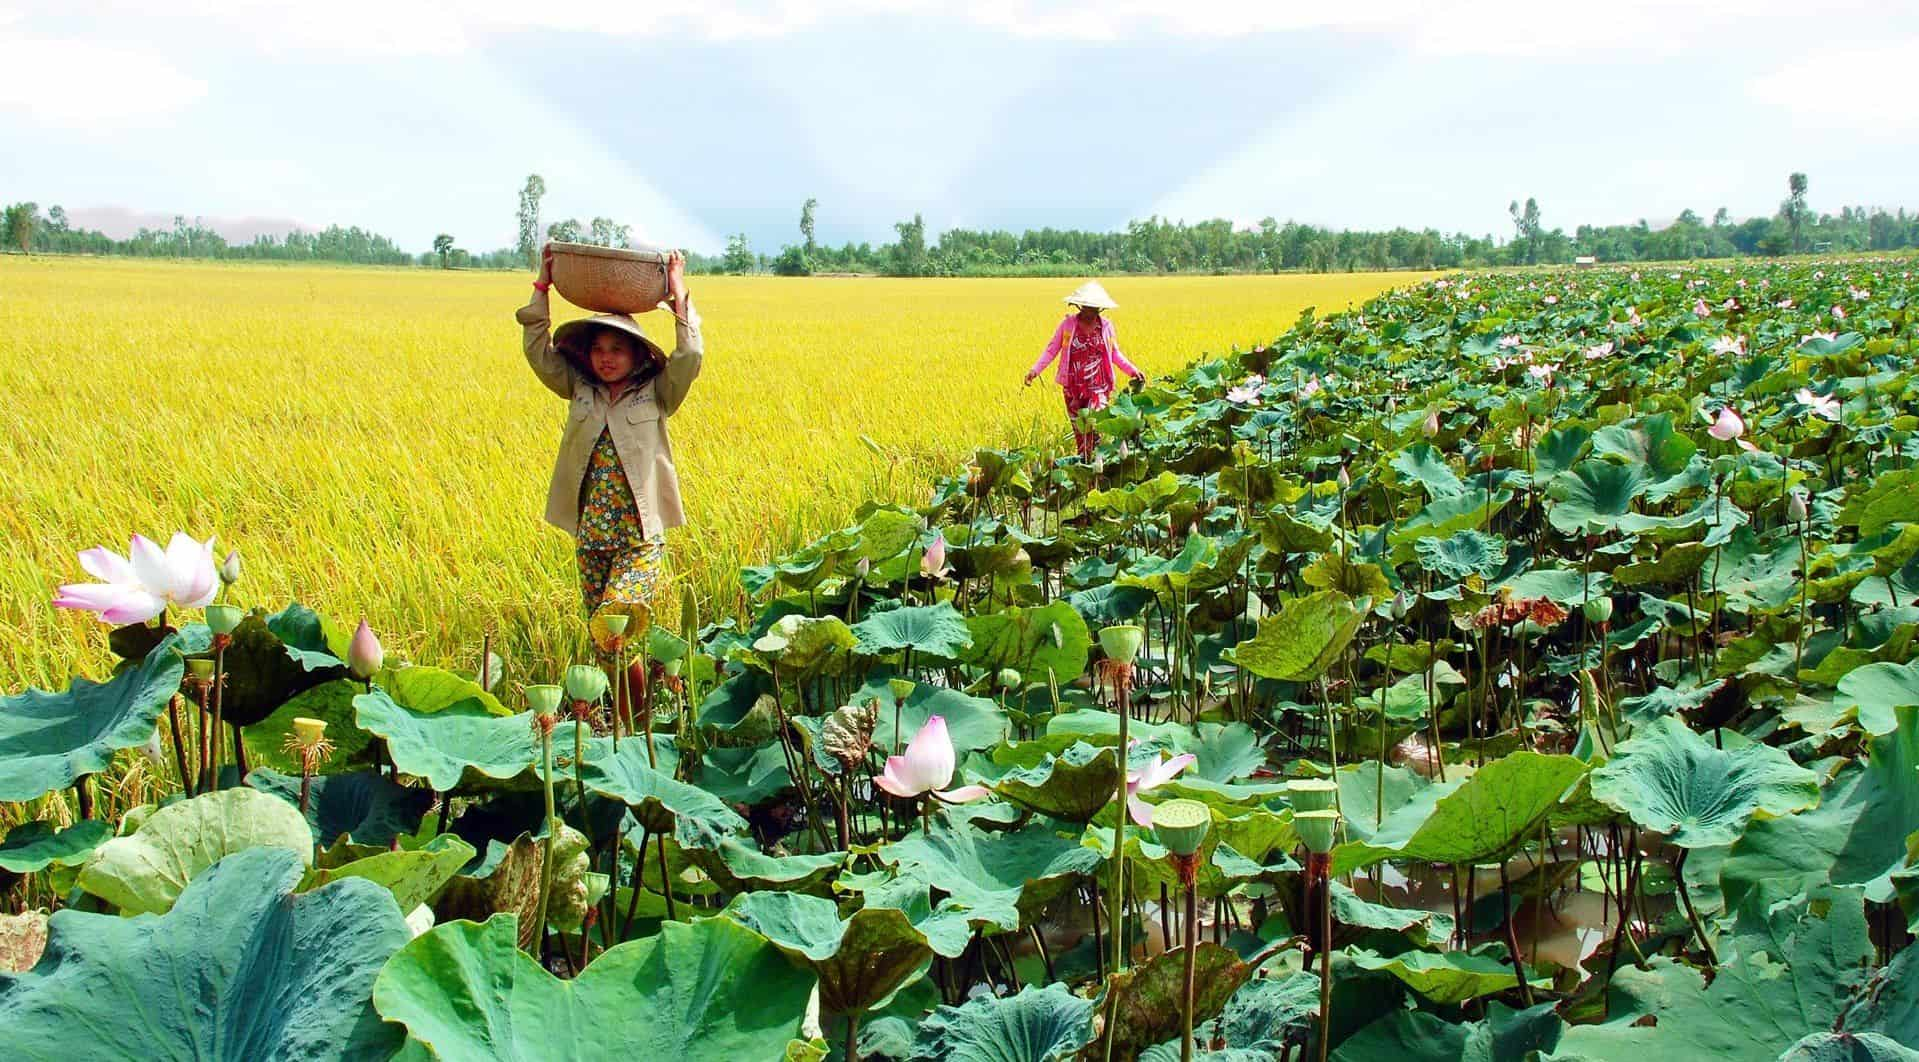 Dong Thap - Mekong Delta provinces